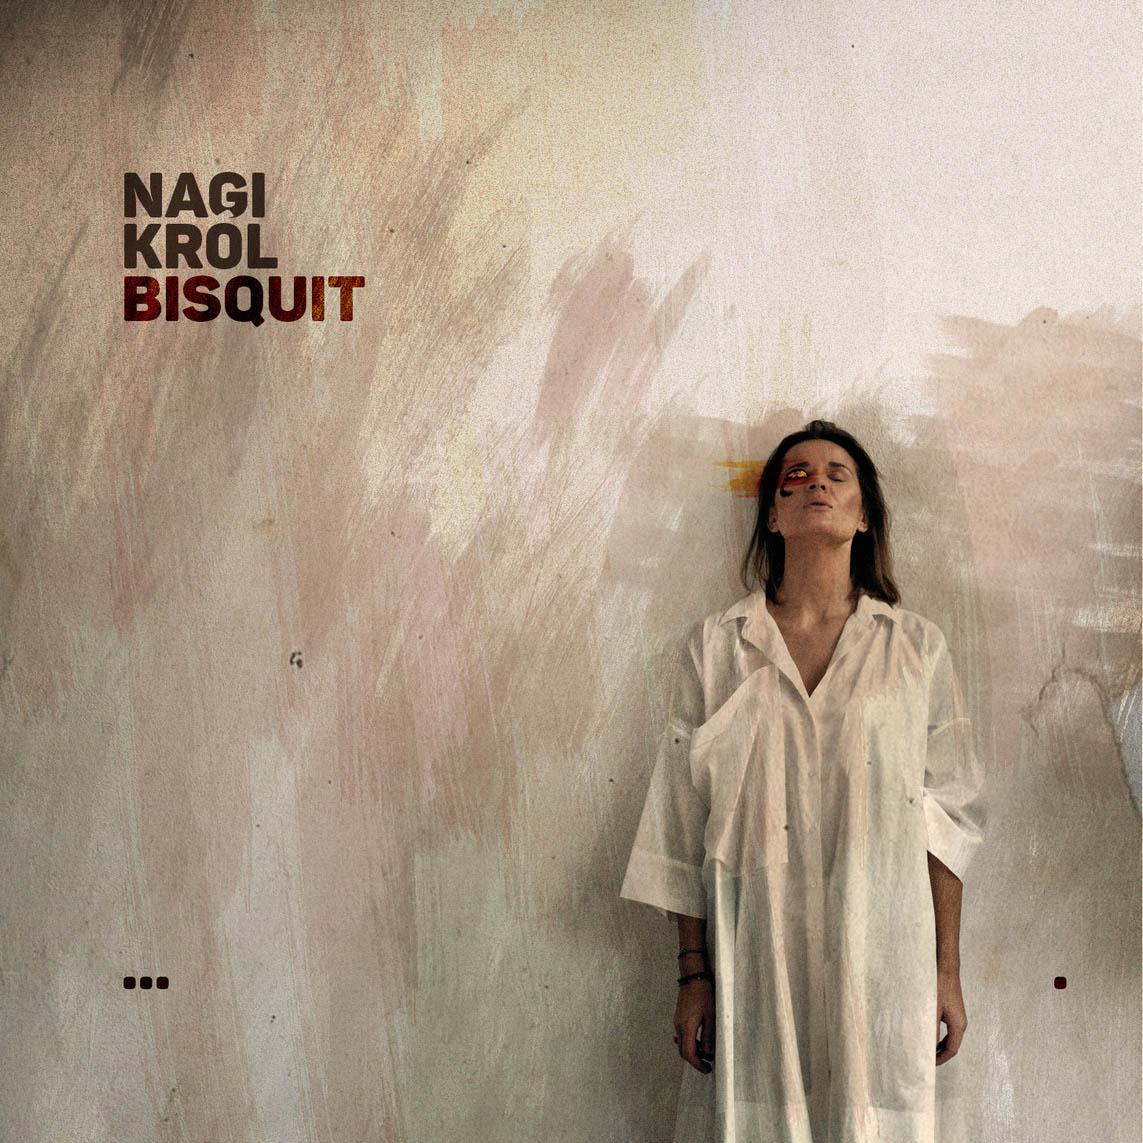 bisquit-nagikrol-cover